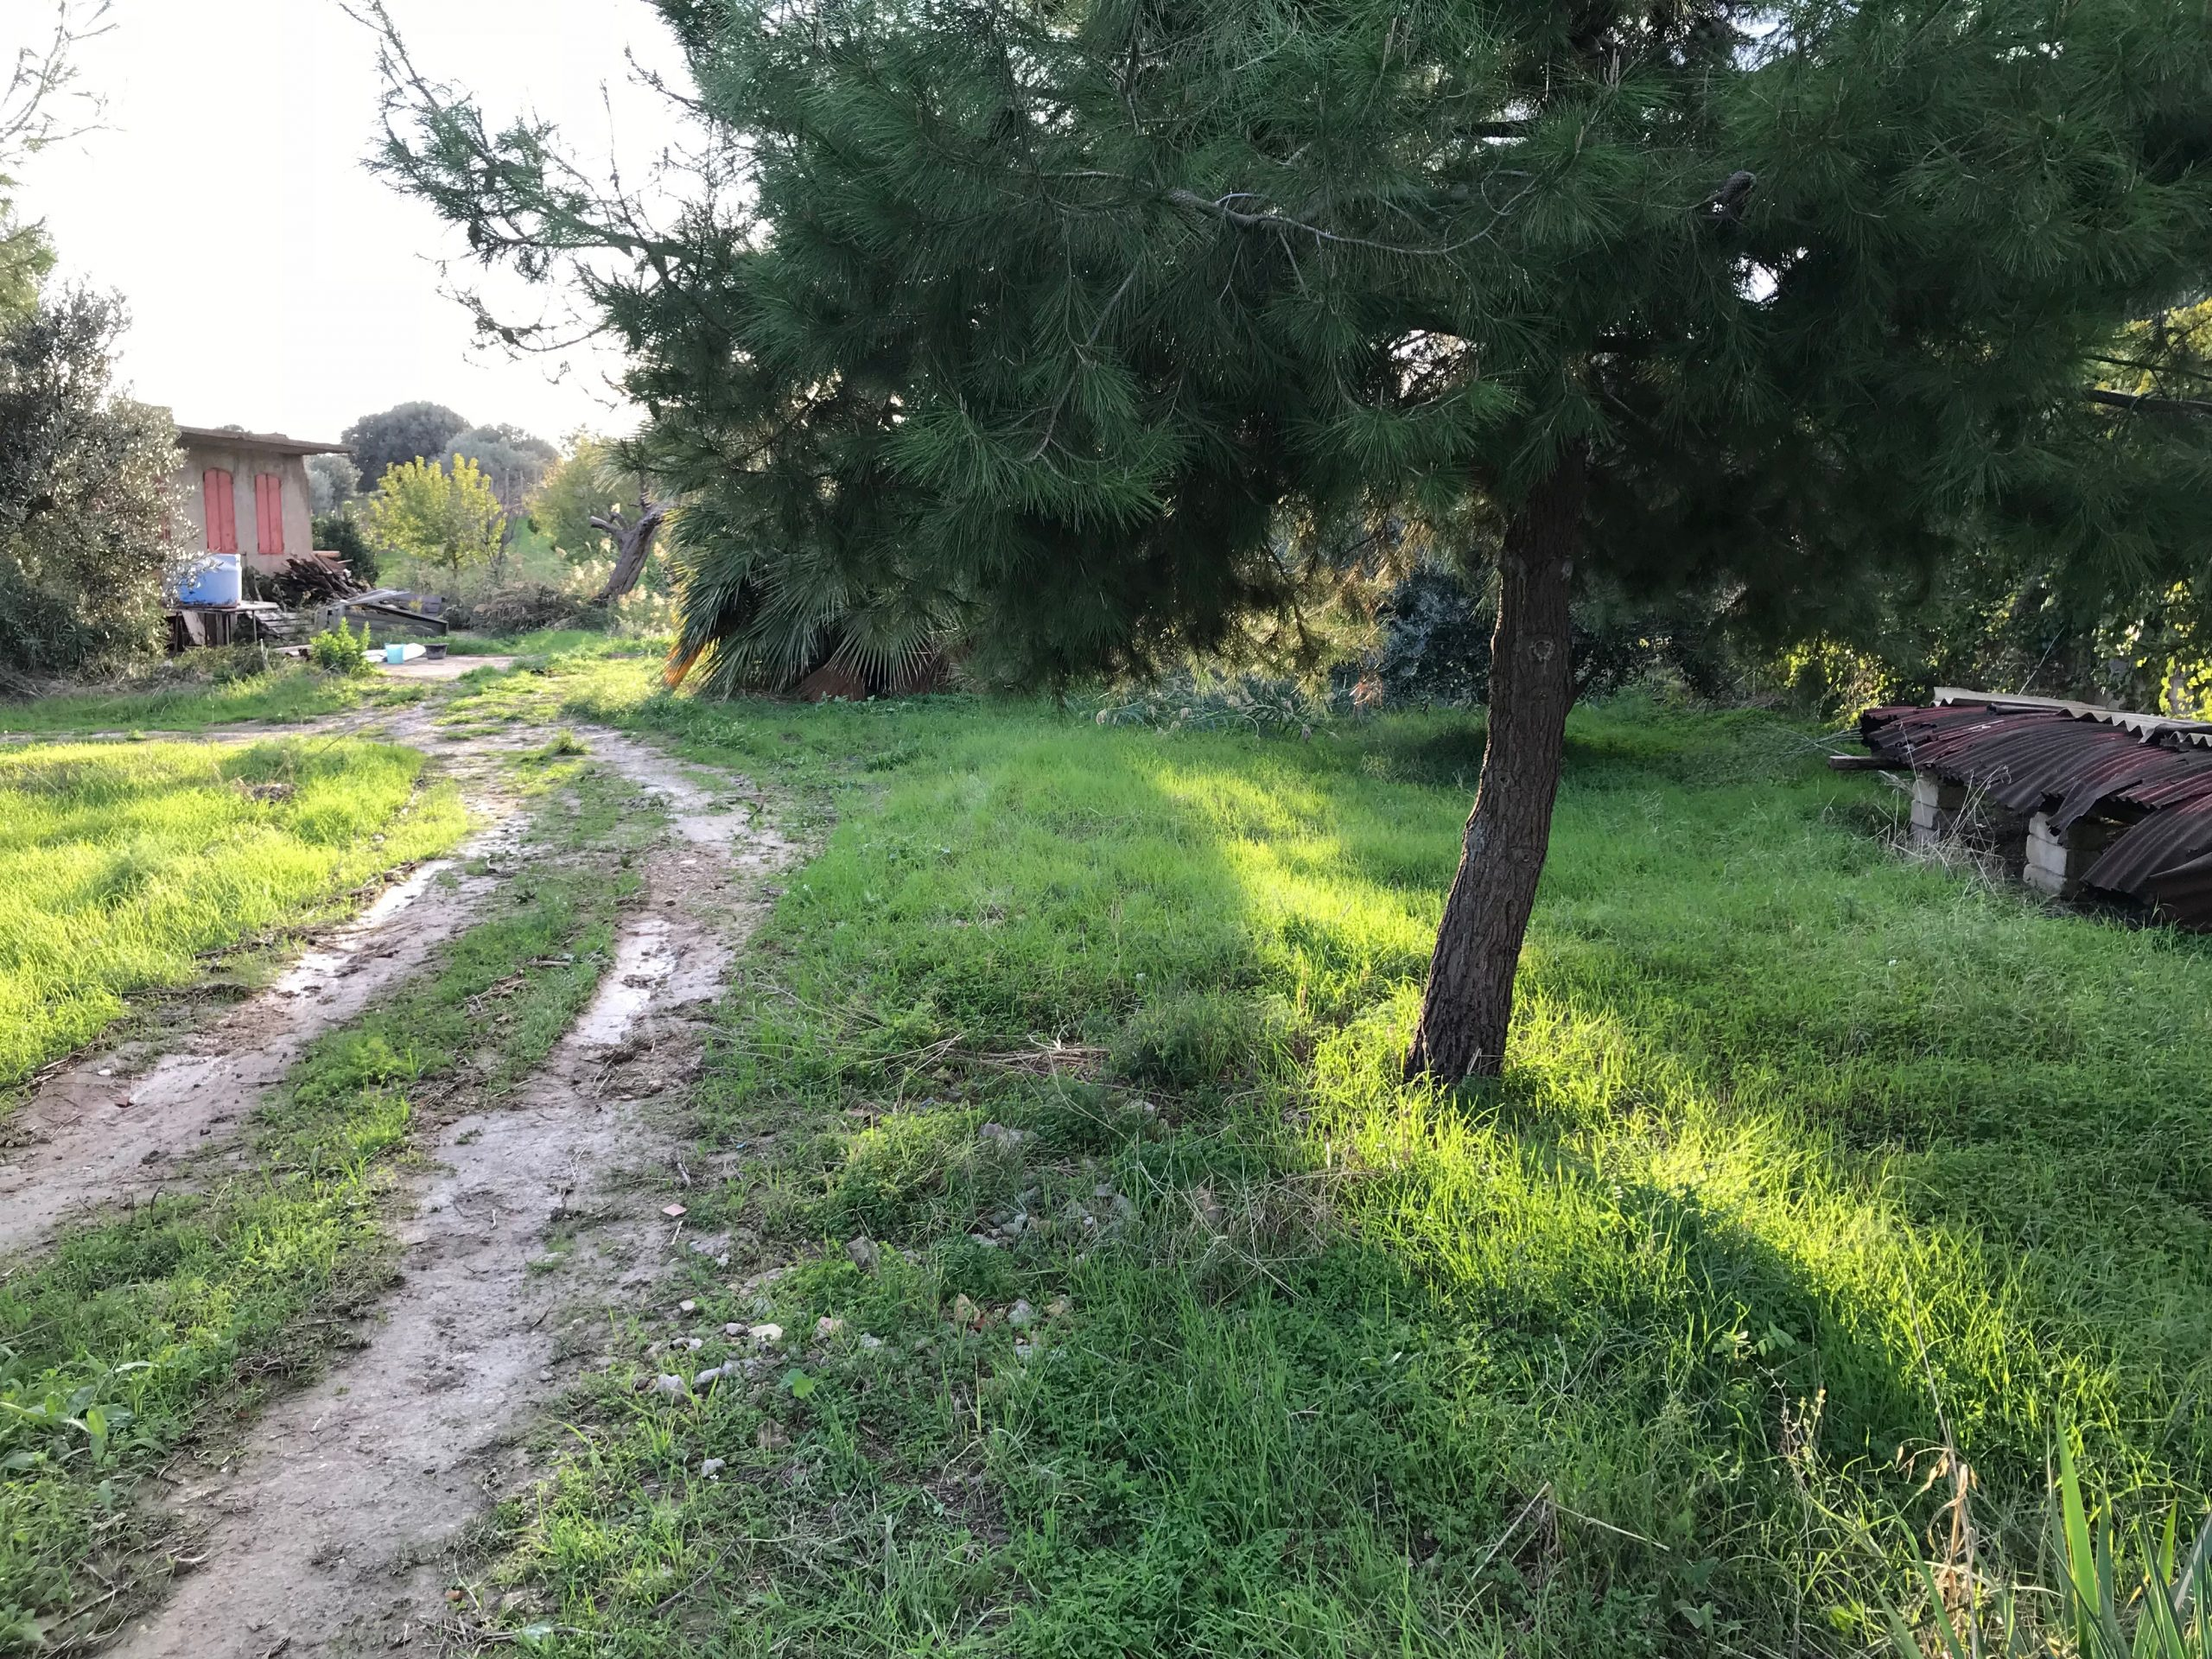 Casale / Cascina in vendita in contrada sant'oliva s.n.c., Licata